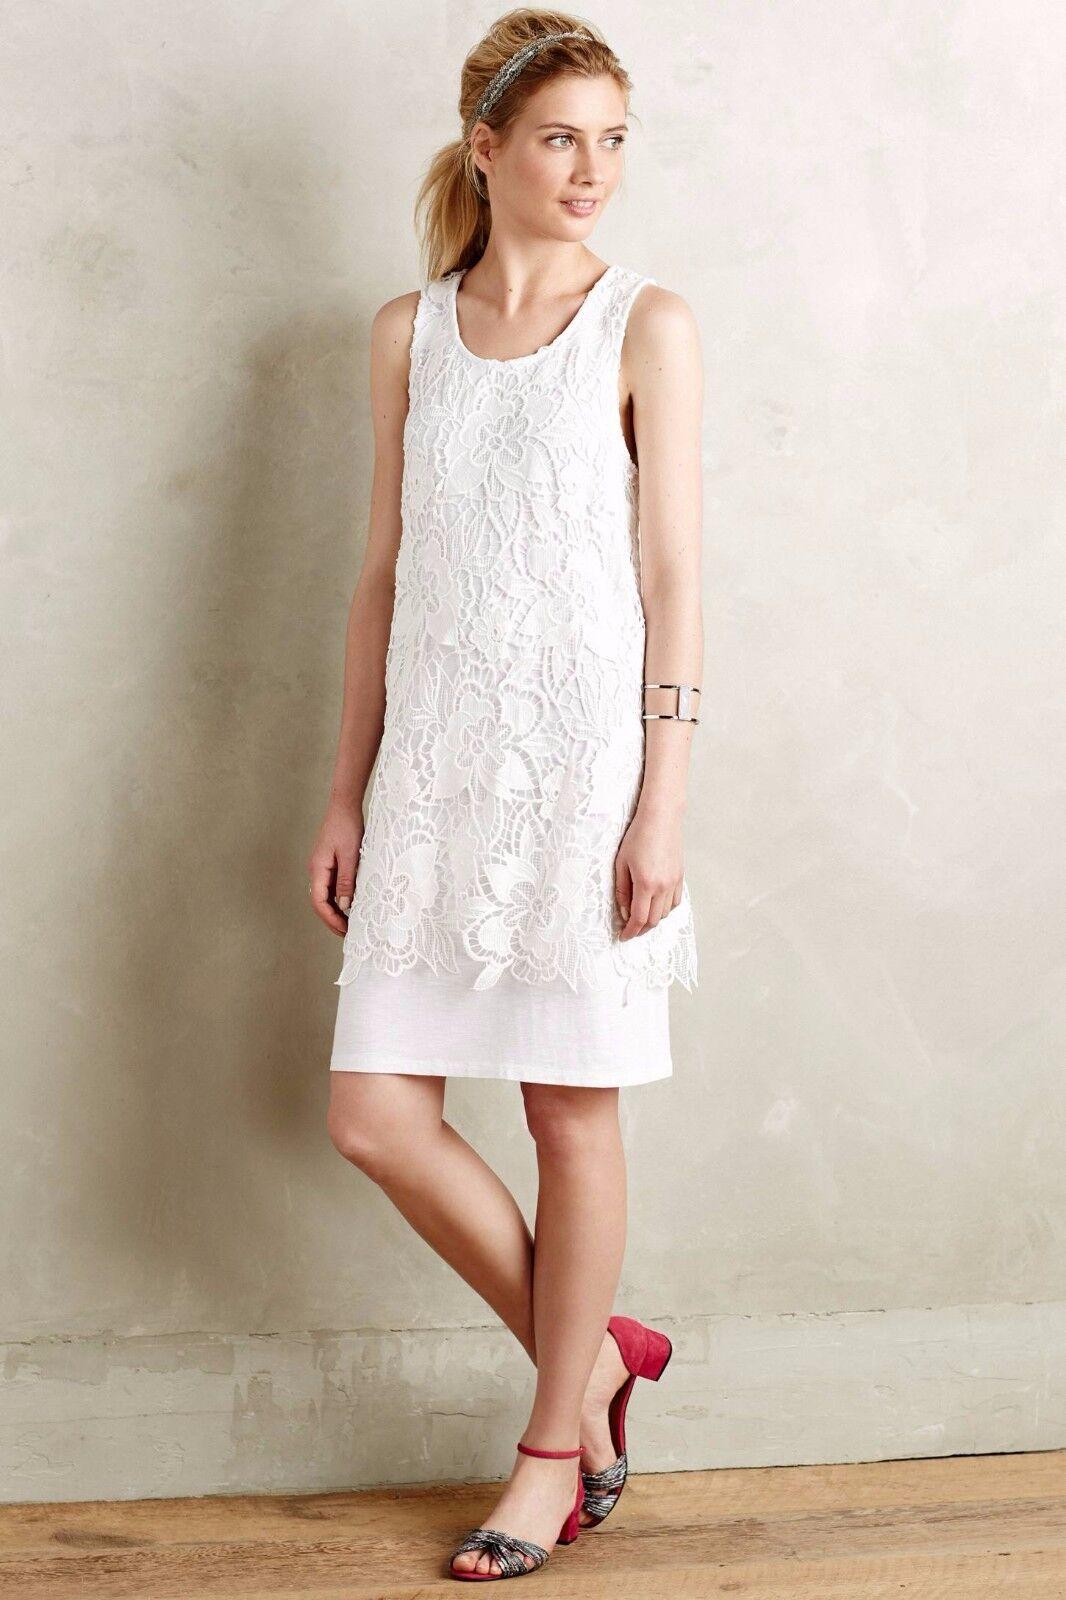 NEW Anthropologie Ingela Lace Dress by Dolan Left Coast ,White, Sz S,